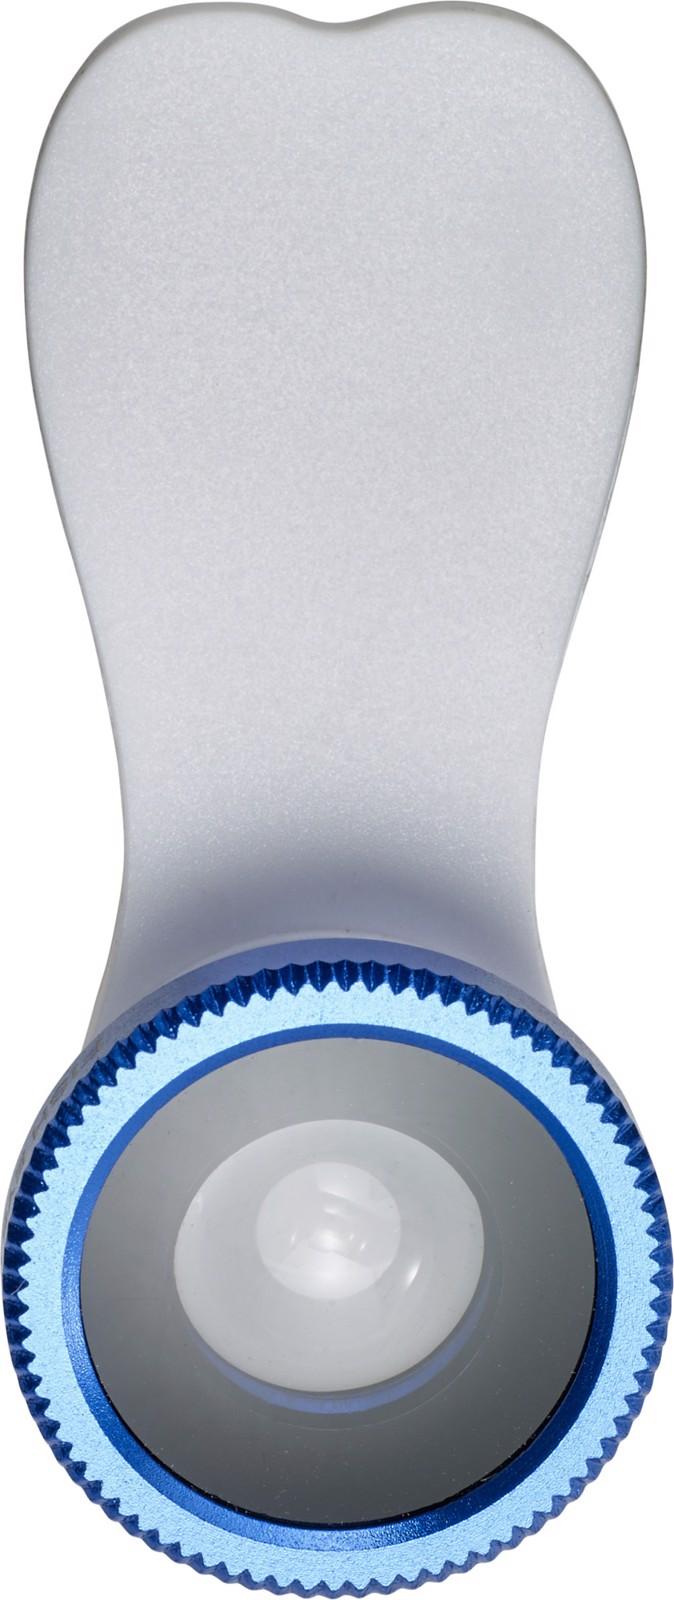 ABS fish eye lens - White